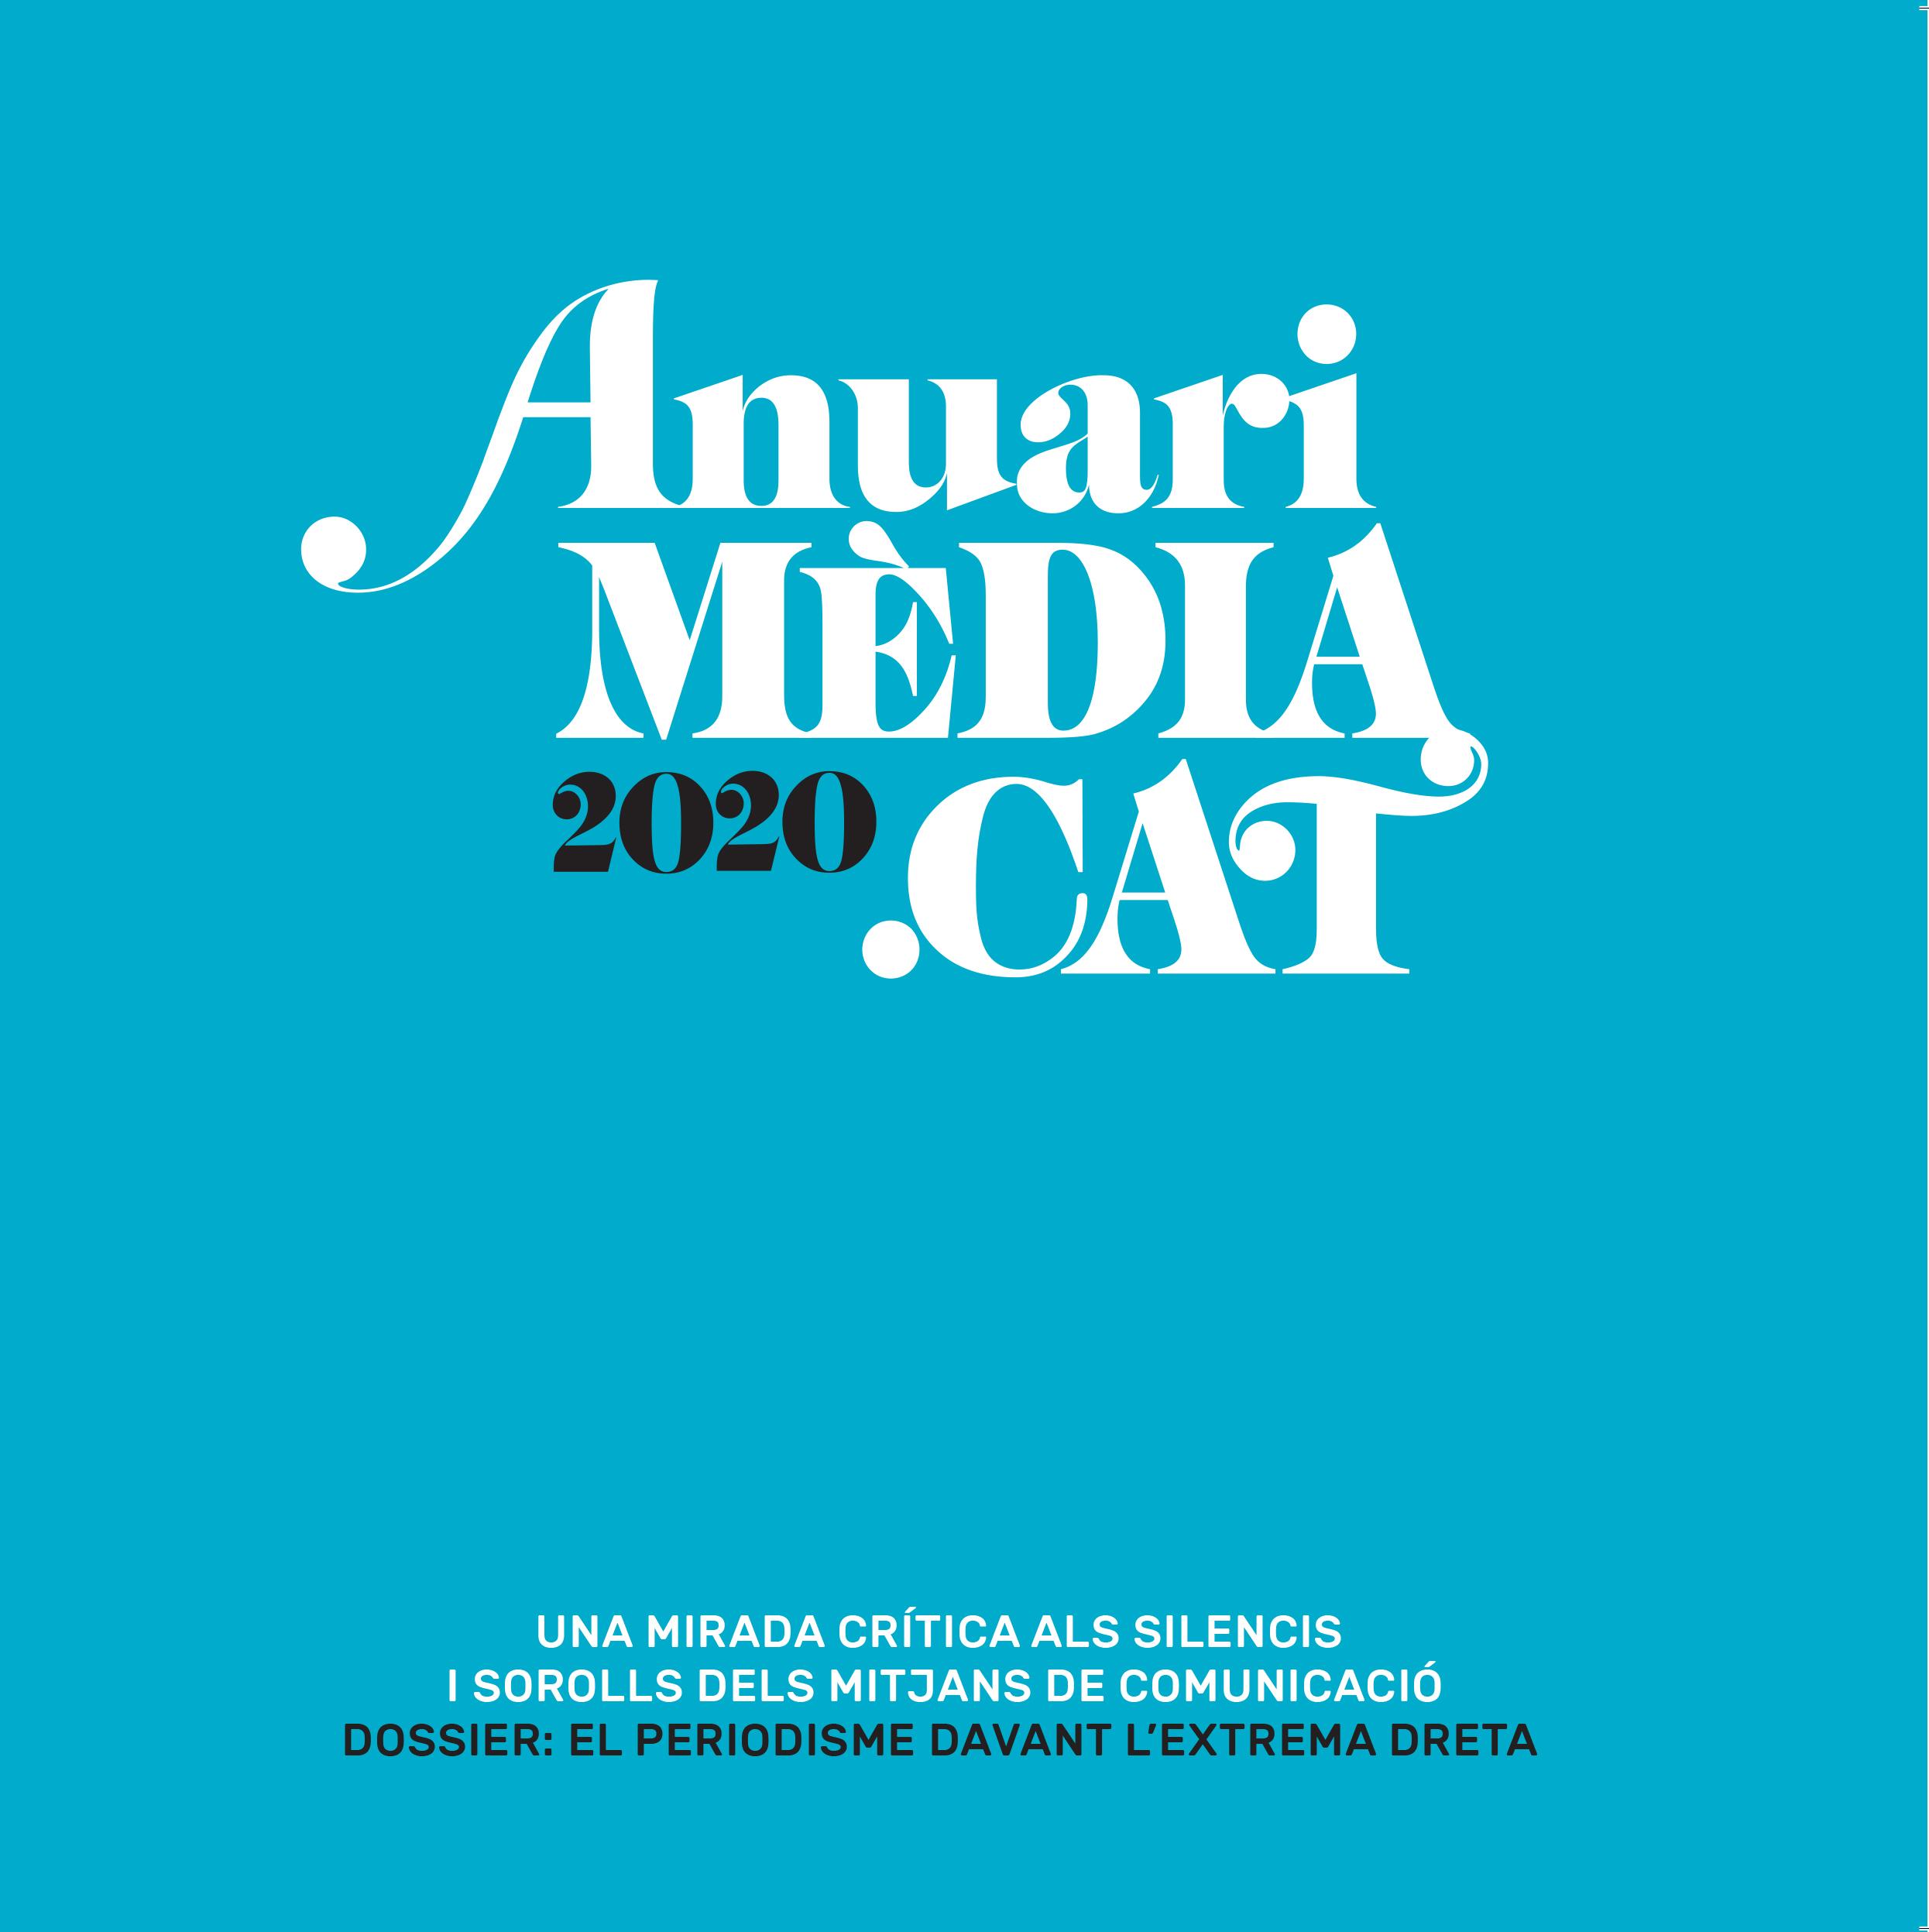 Anuari Mèdia.cat 2020